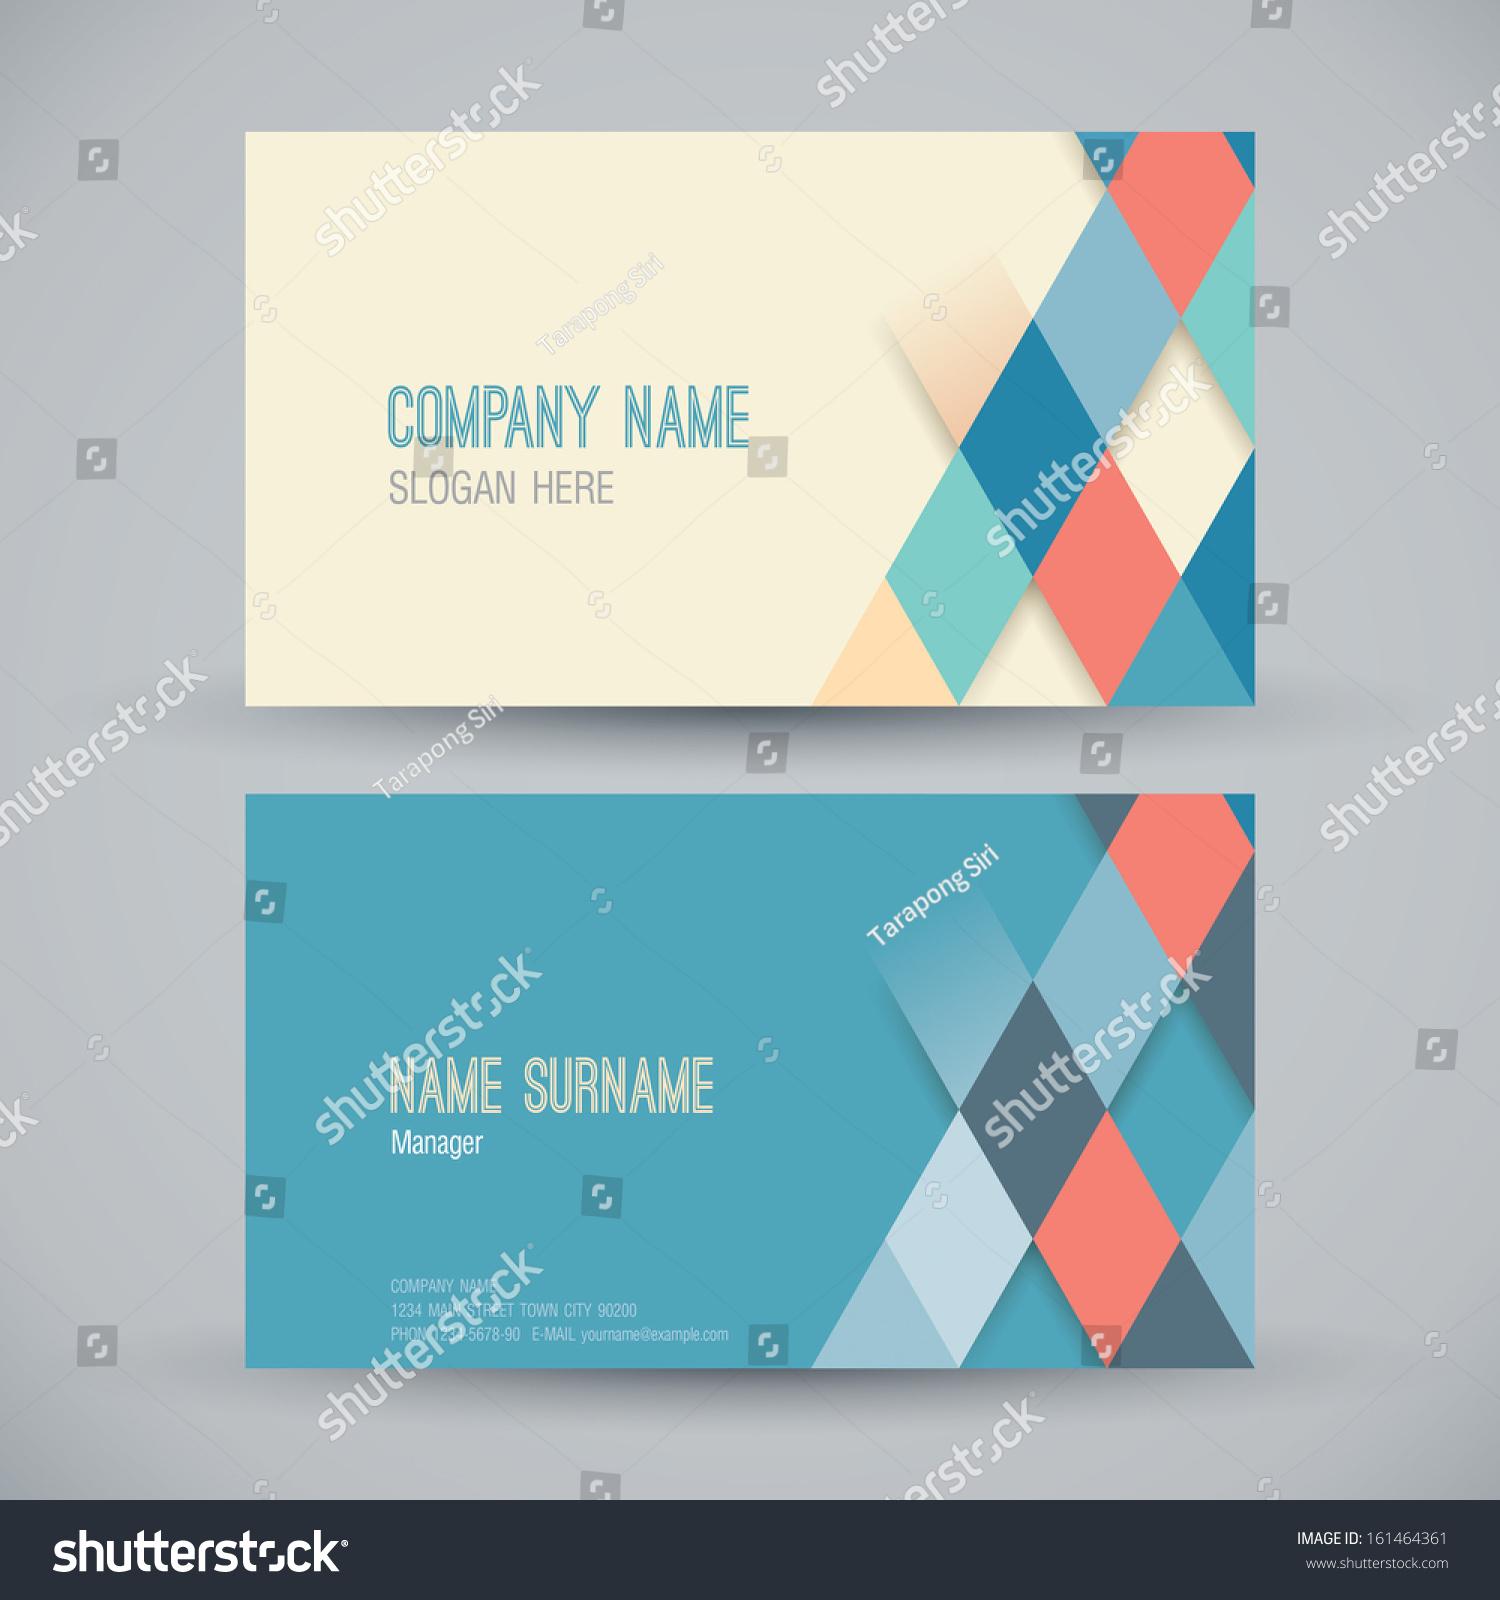 name card design template business card stock vector 161464361 shutterstock. Black Bedroom Furniture Sets. Home Design Ideas